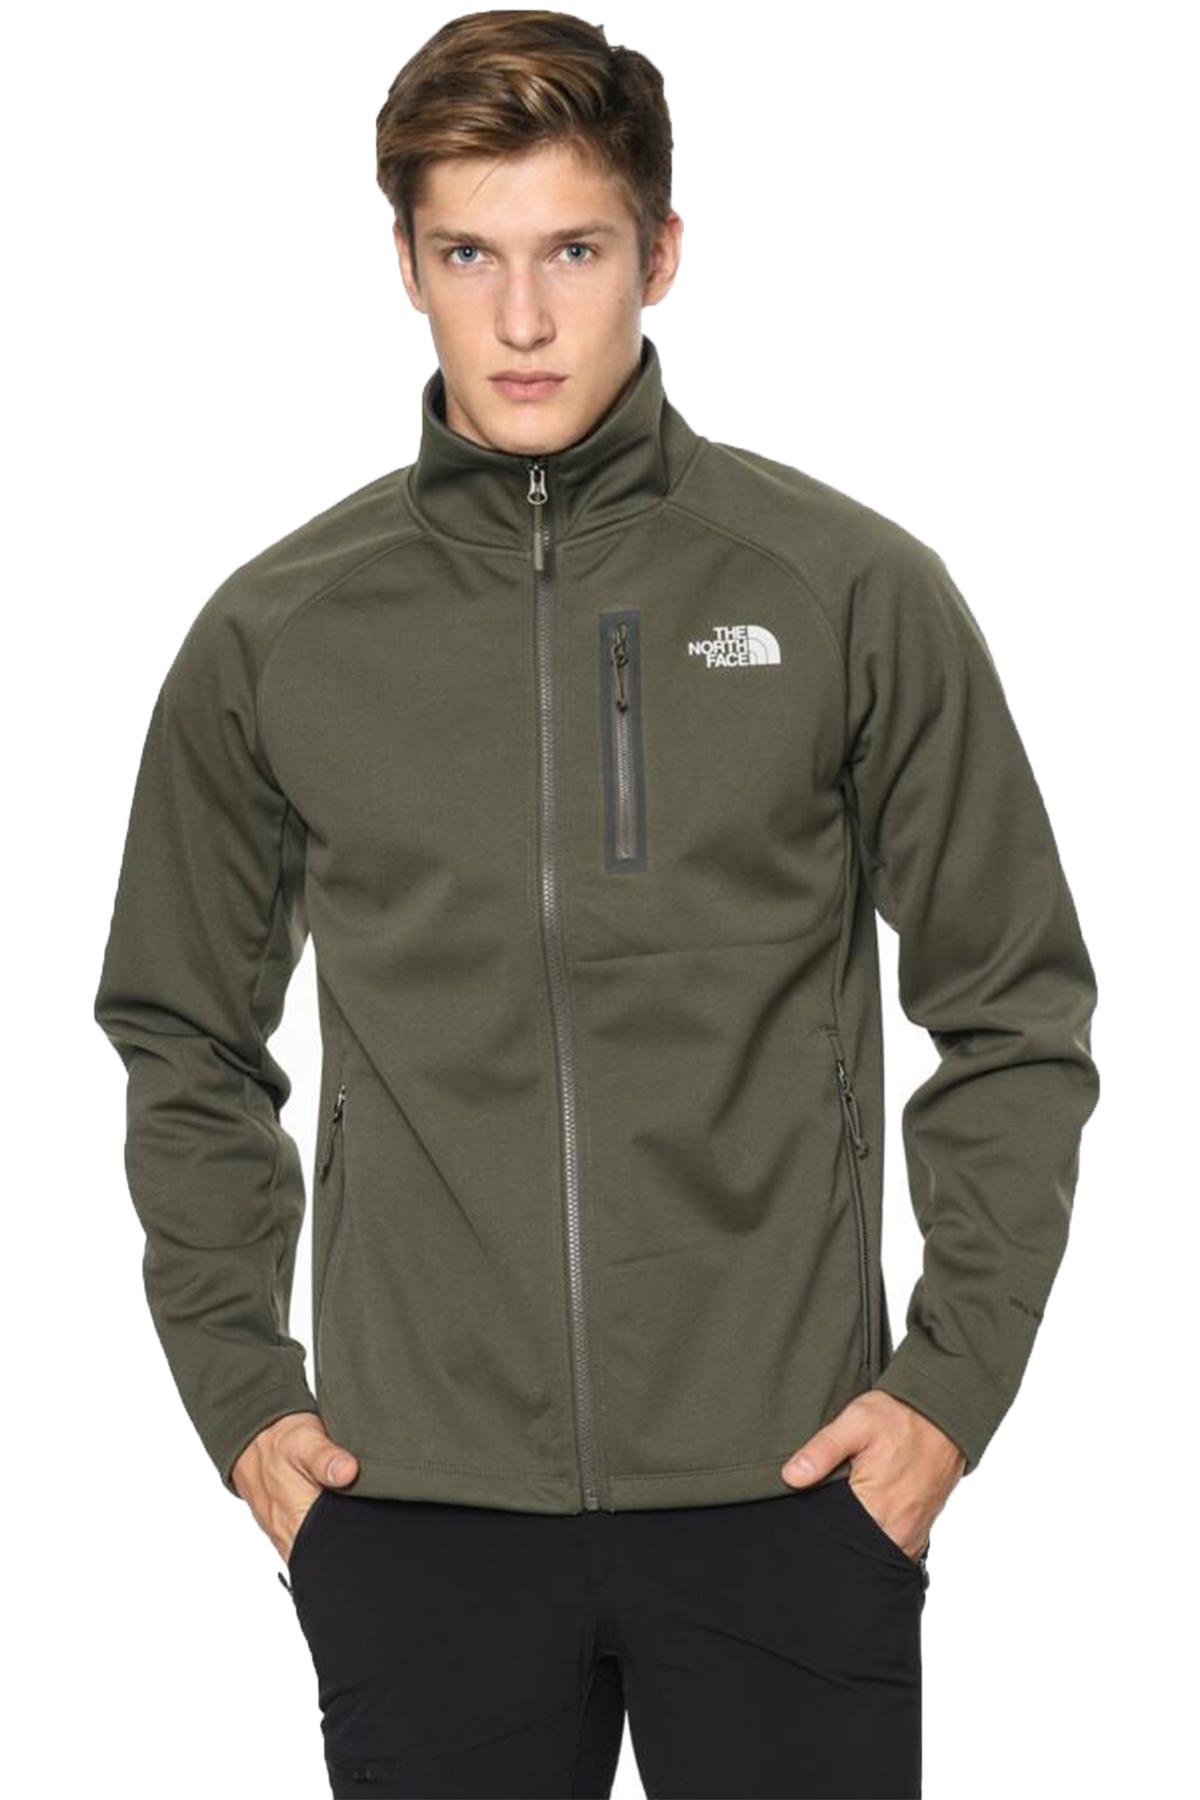 The North Face Can Soft Shell Full Zip Erkek Sweatshirt Yeşil (NF0A3BRHJNT1WP24)